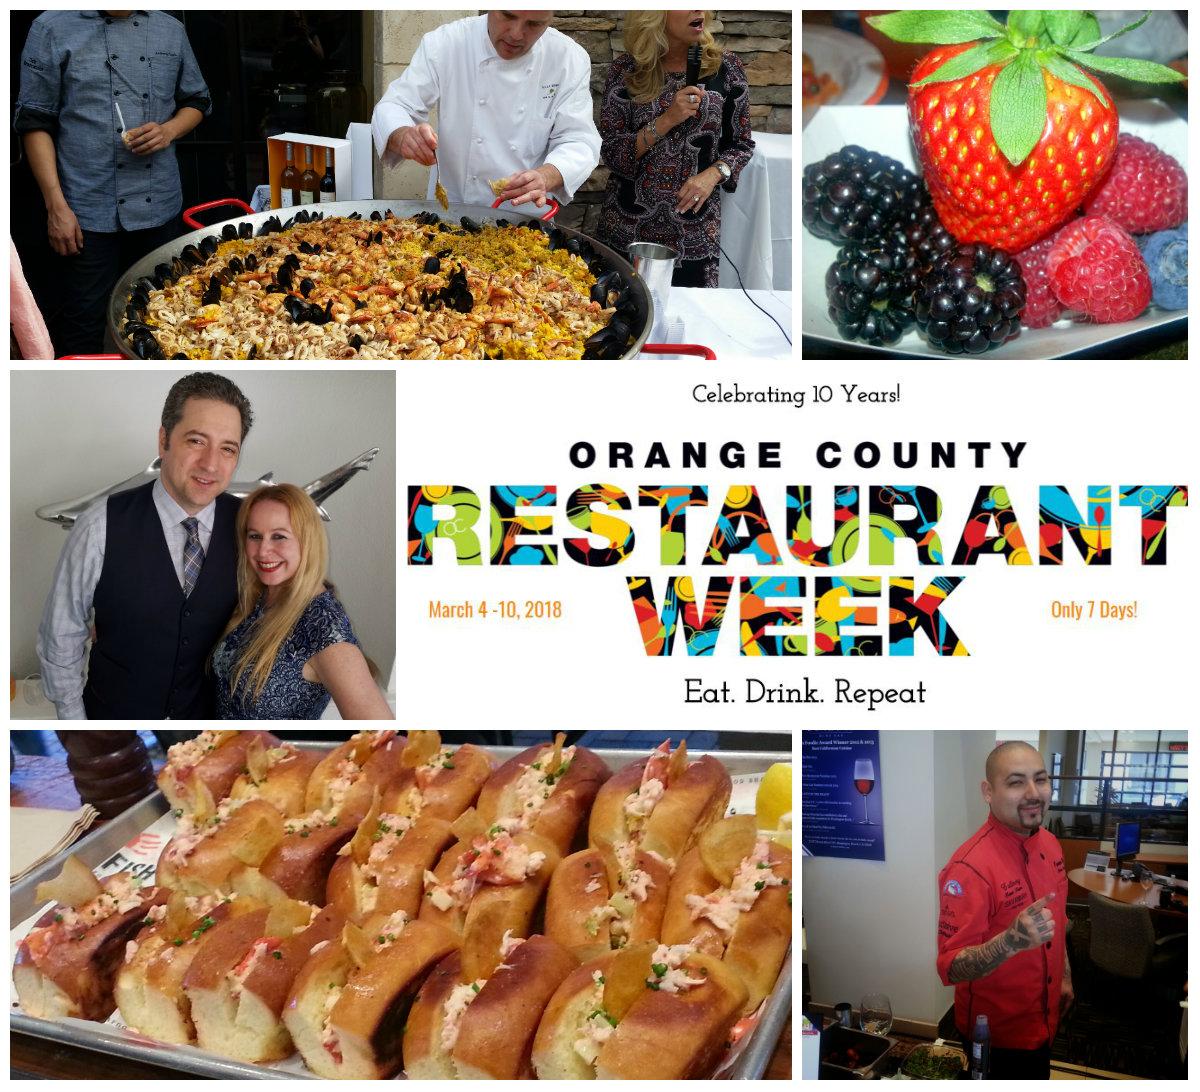 Orange County Restaurant Week Celebrates 10 Years March 4 10